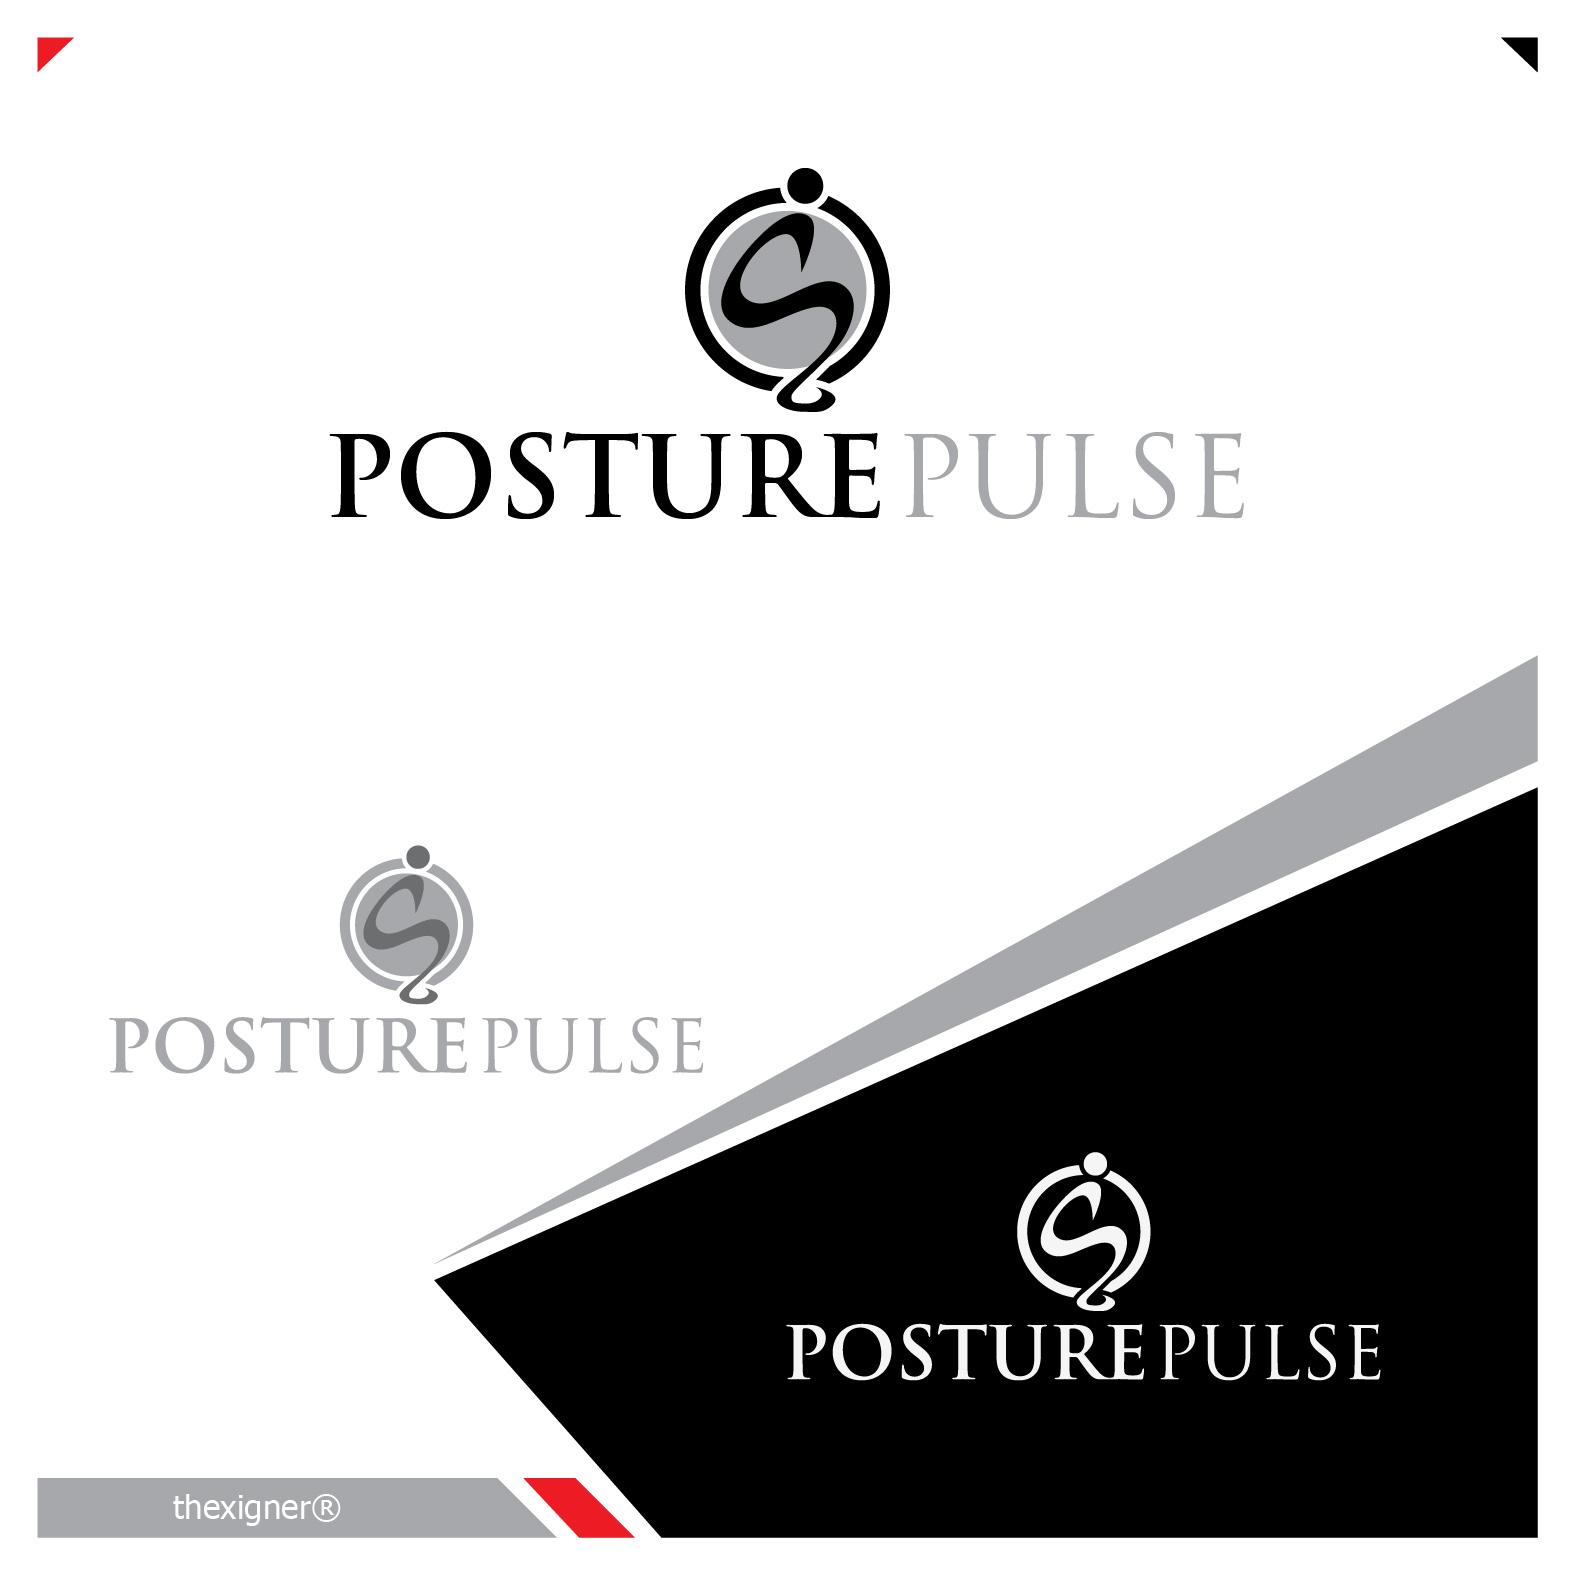 Logo Design by lagalag - Entry No. 69 in the Logo Design Contest Unique Logo Design Wanted for PosturePulse.